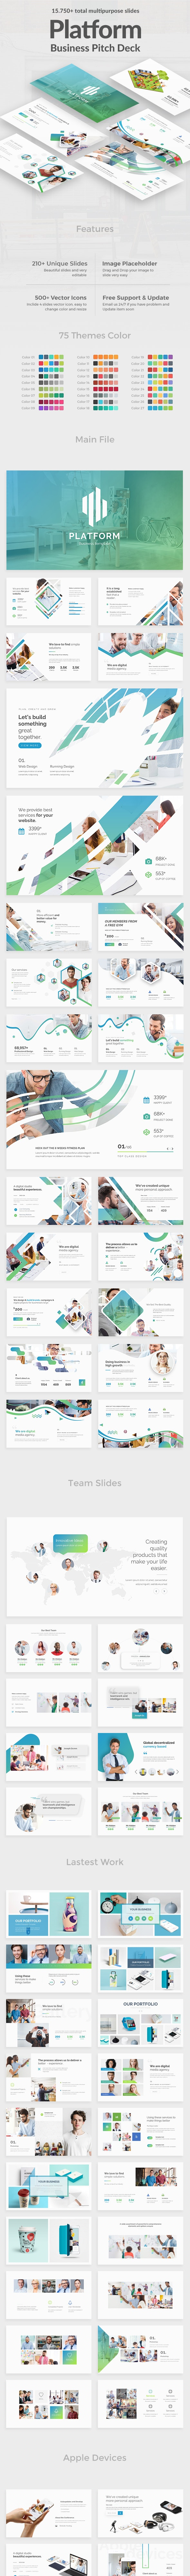 Business Platform Pitch Deck Powerpoint Template - Business PowerPoint Templates